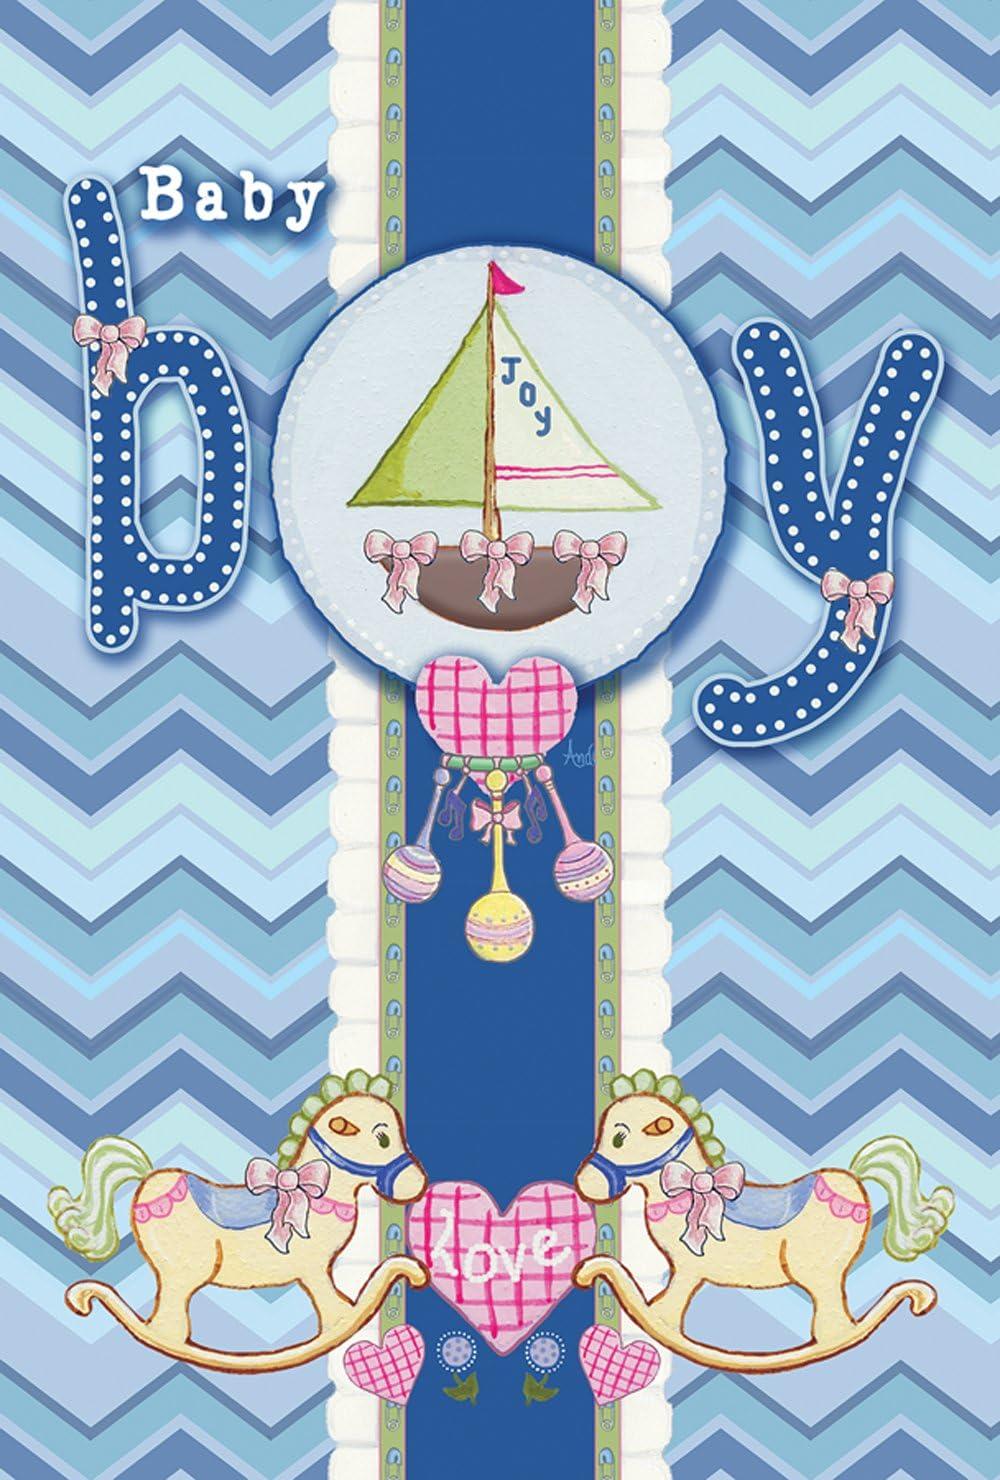 "Toland Home Garden 119866 It's a Baby Boy 12.5 X 18 Inch Decorative, Garden Flag (12.5"" x 18"")"